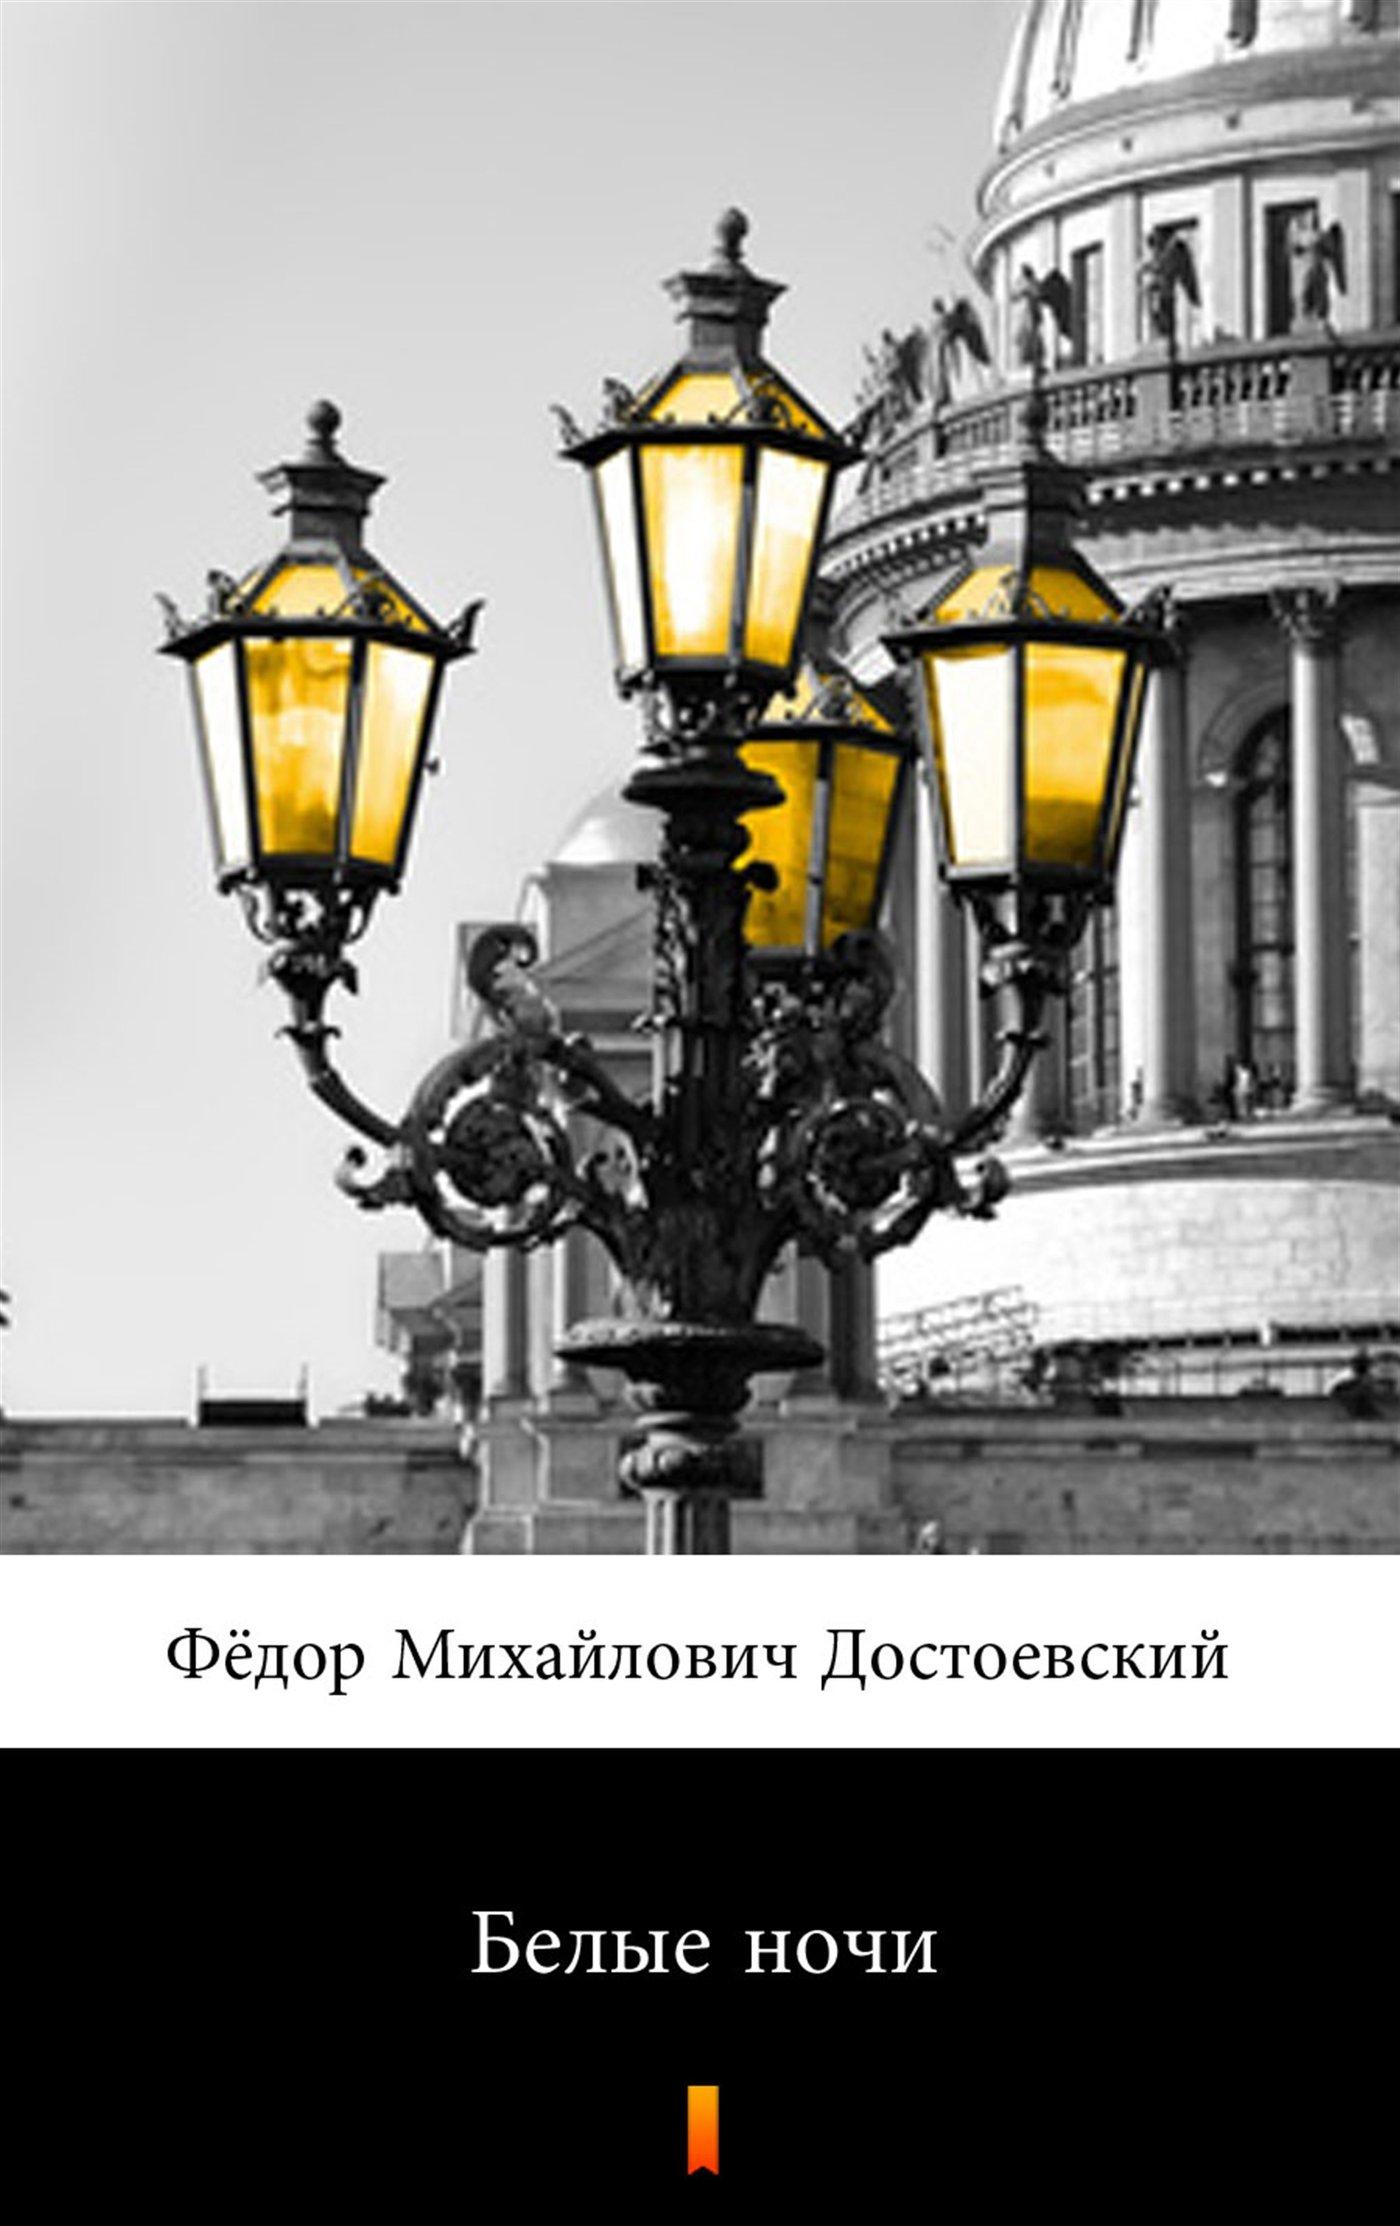 Белые ночи - Ebook (Książka EPUB) do pobrania w formacie EPUB